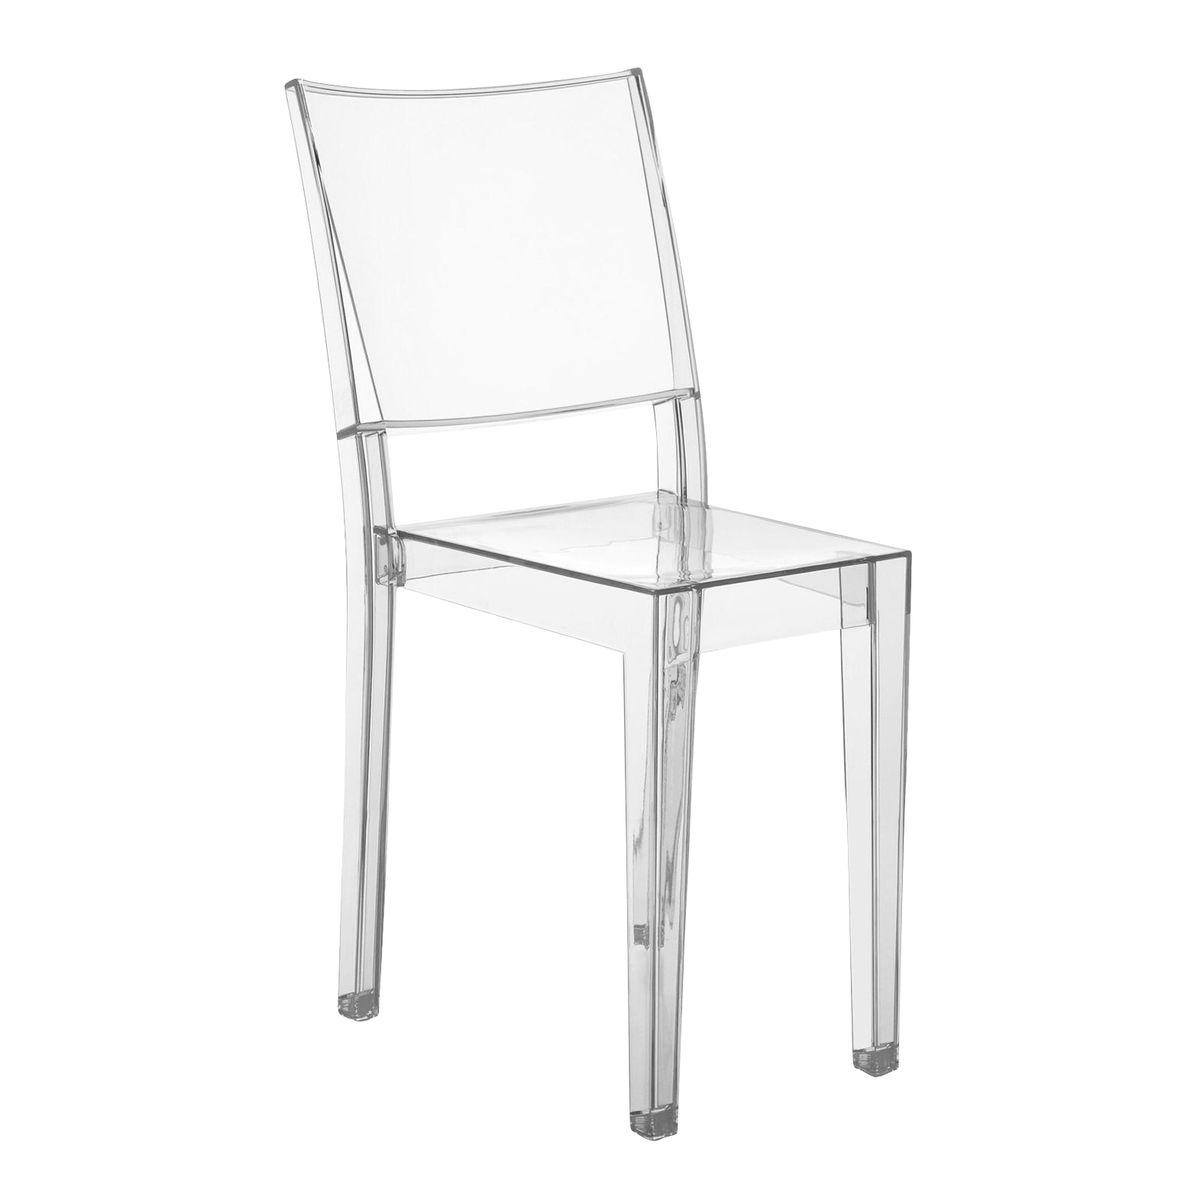 la marie chair  kartell  ambientedirectcom - kartell  la marie chair  crystal cleartransparent